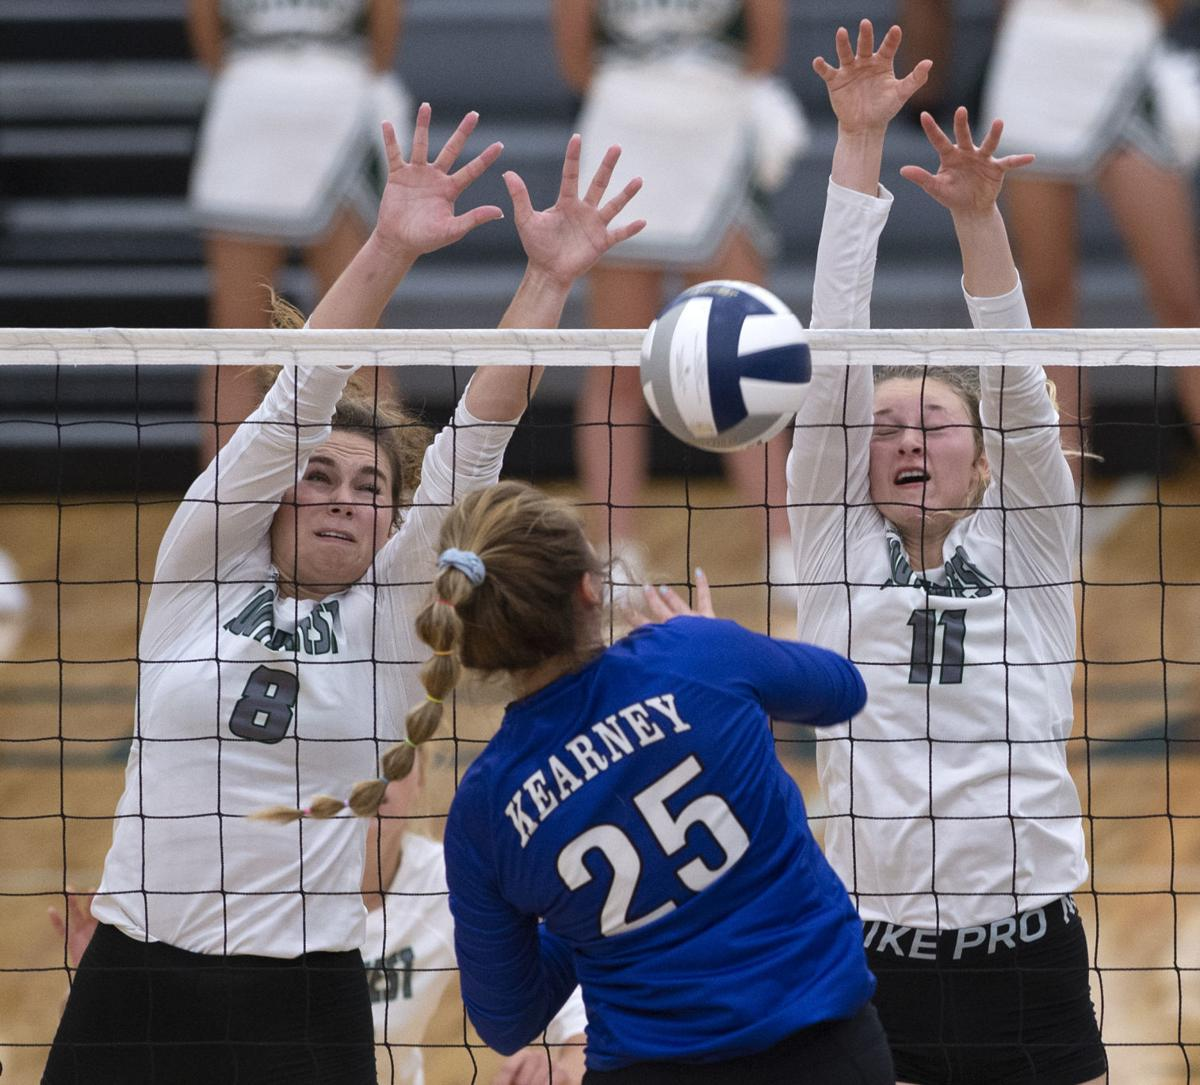 Prep volleyball, Southwest vs. Kearney, 9.5